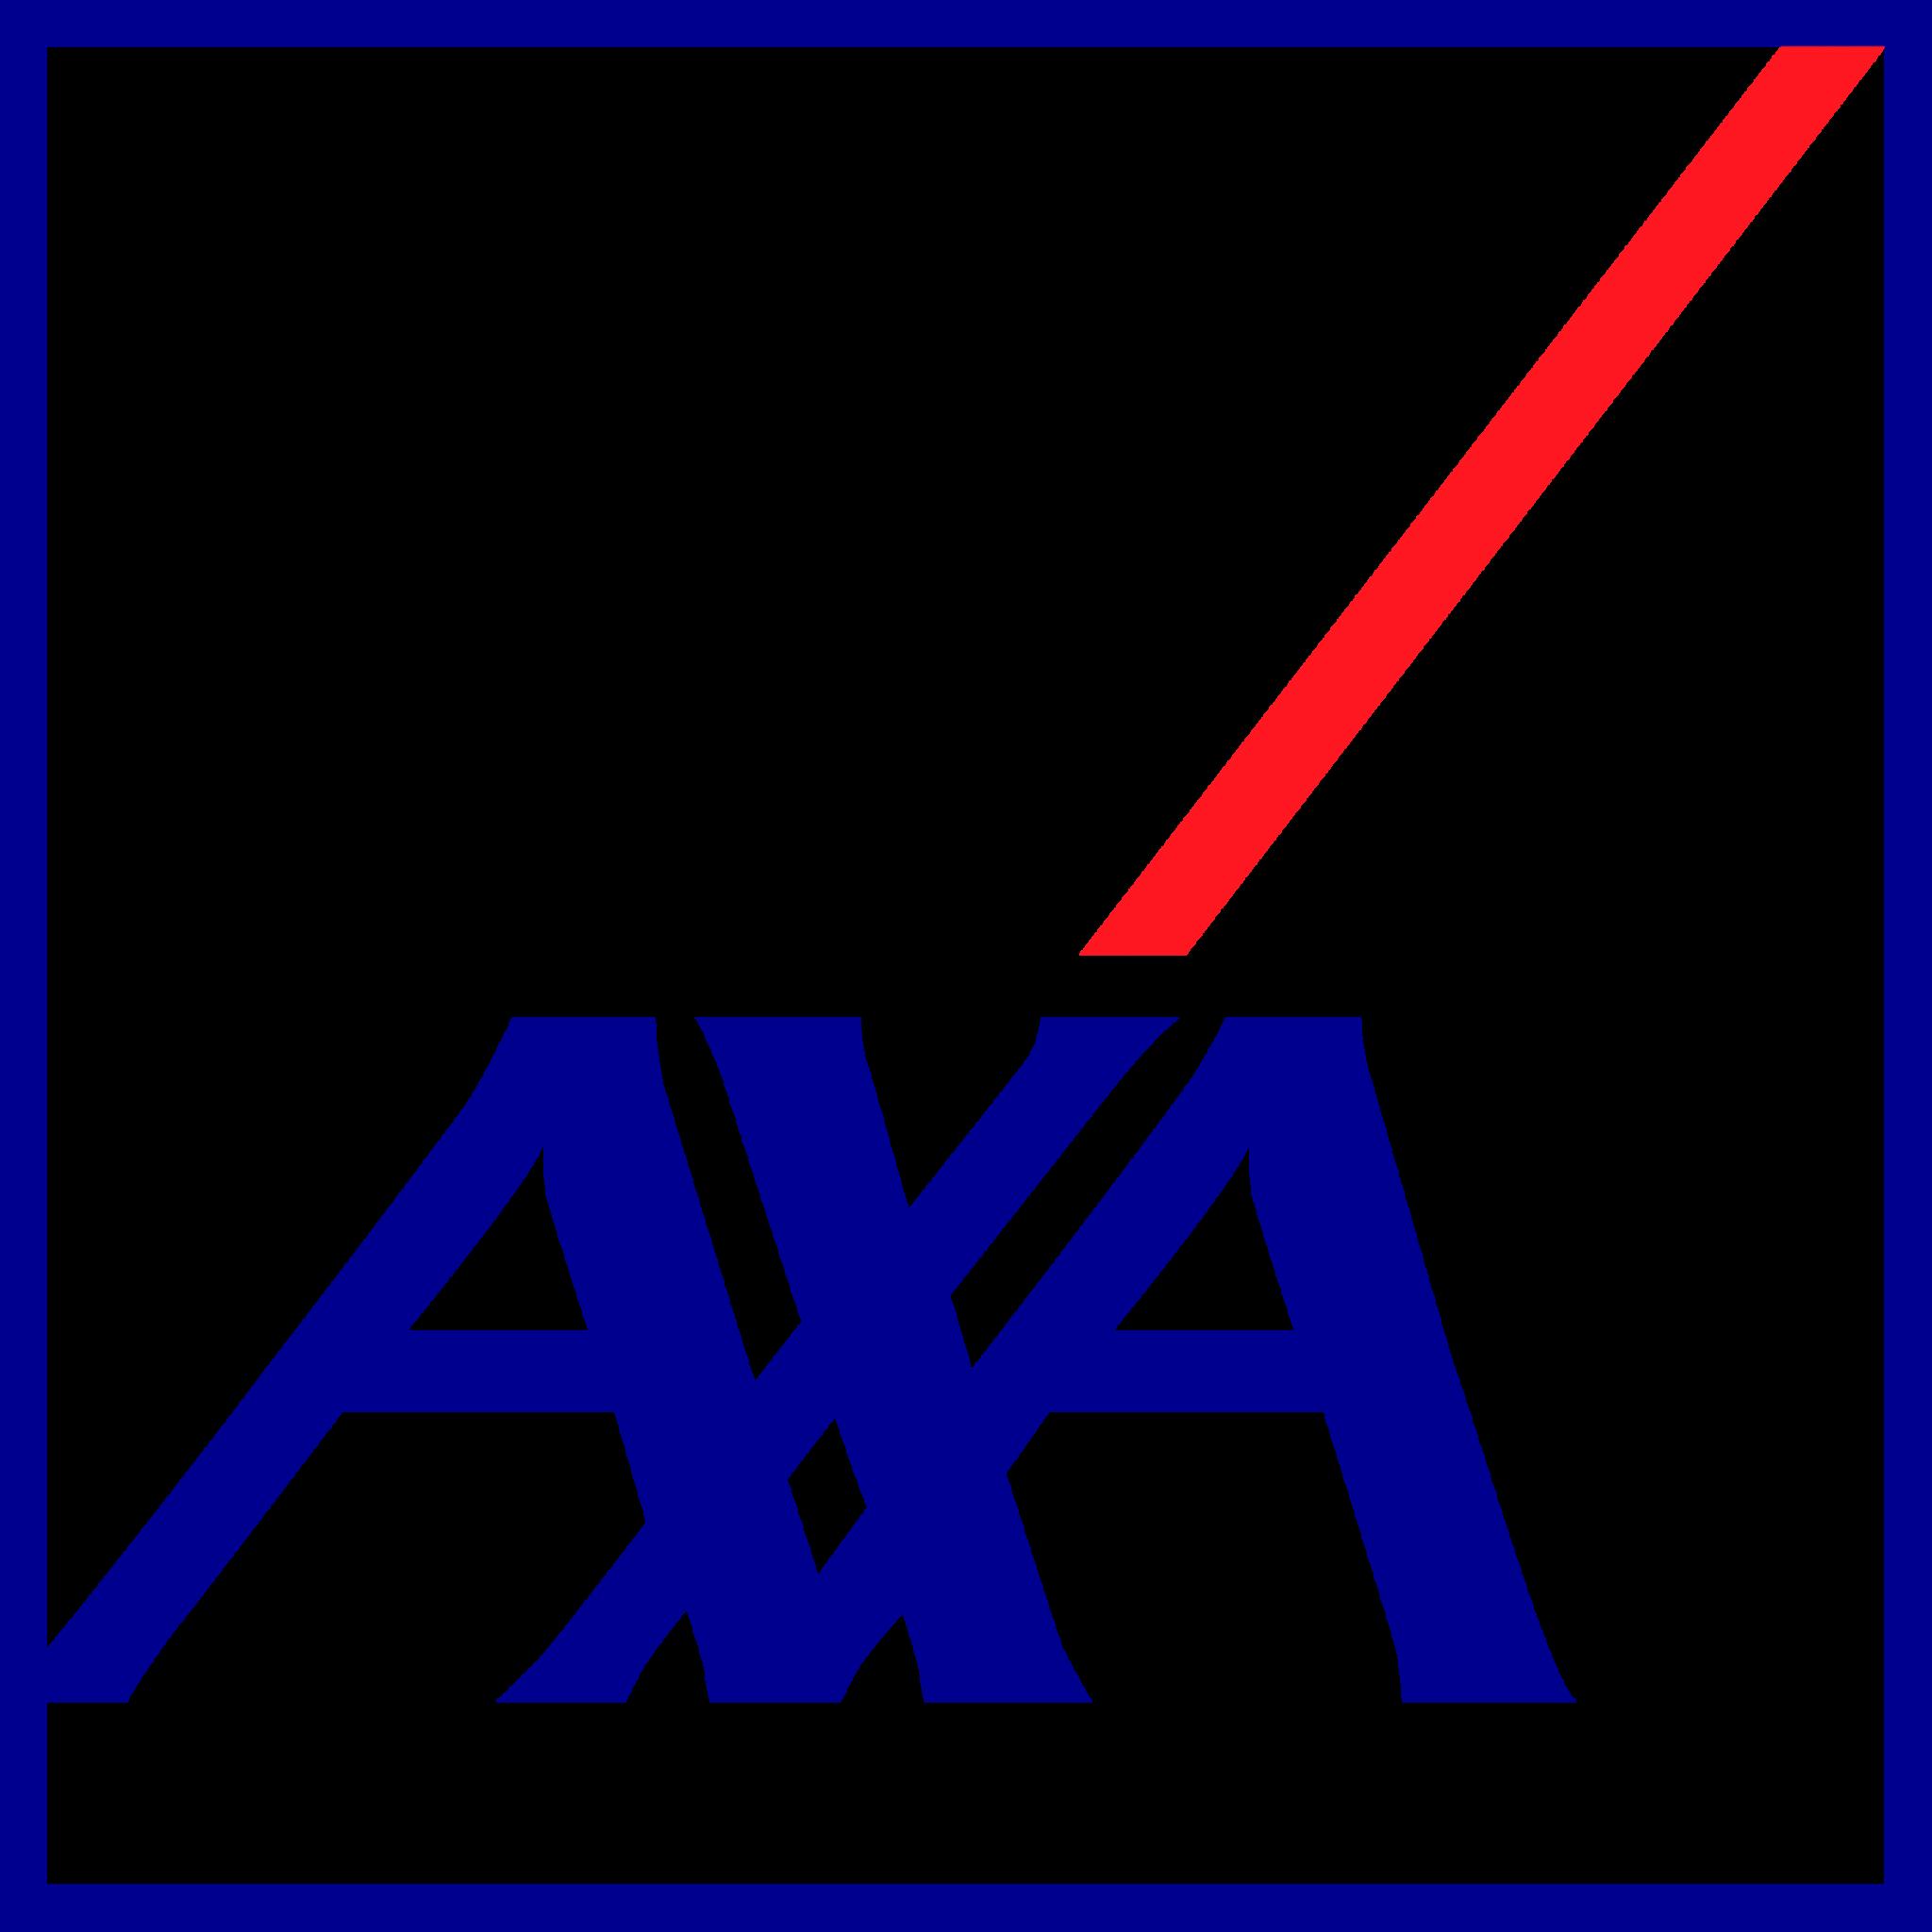 axa_logo_open_blue_rgb